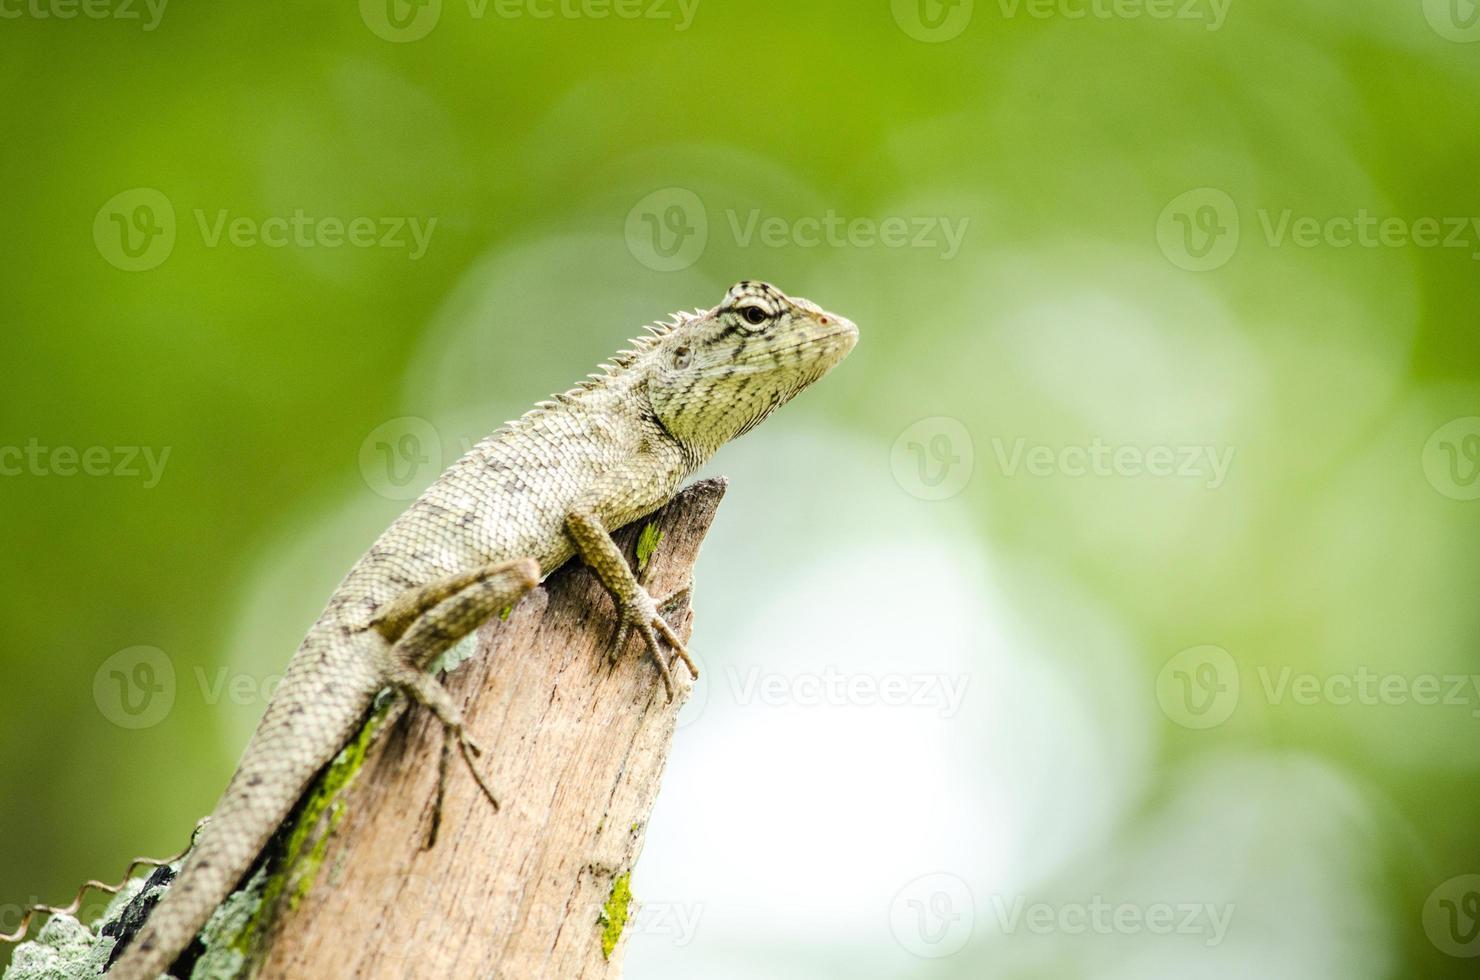 calotes emma alticristatus is spcies name of reptile photo